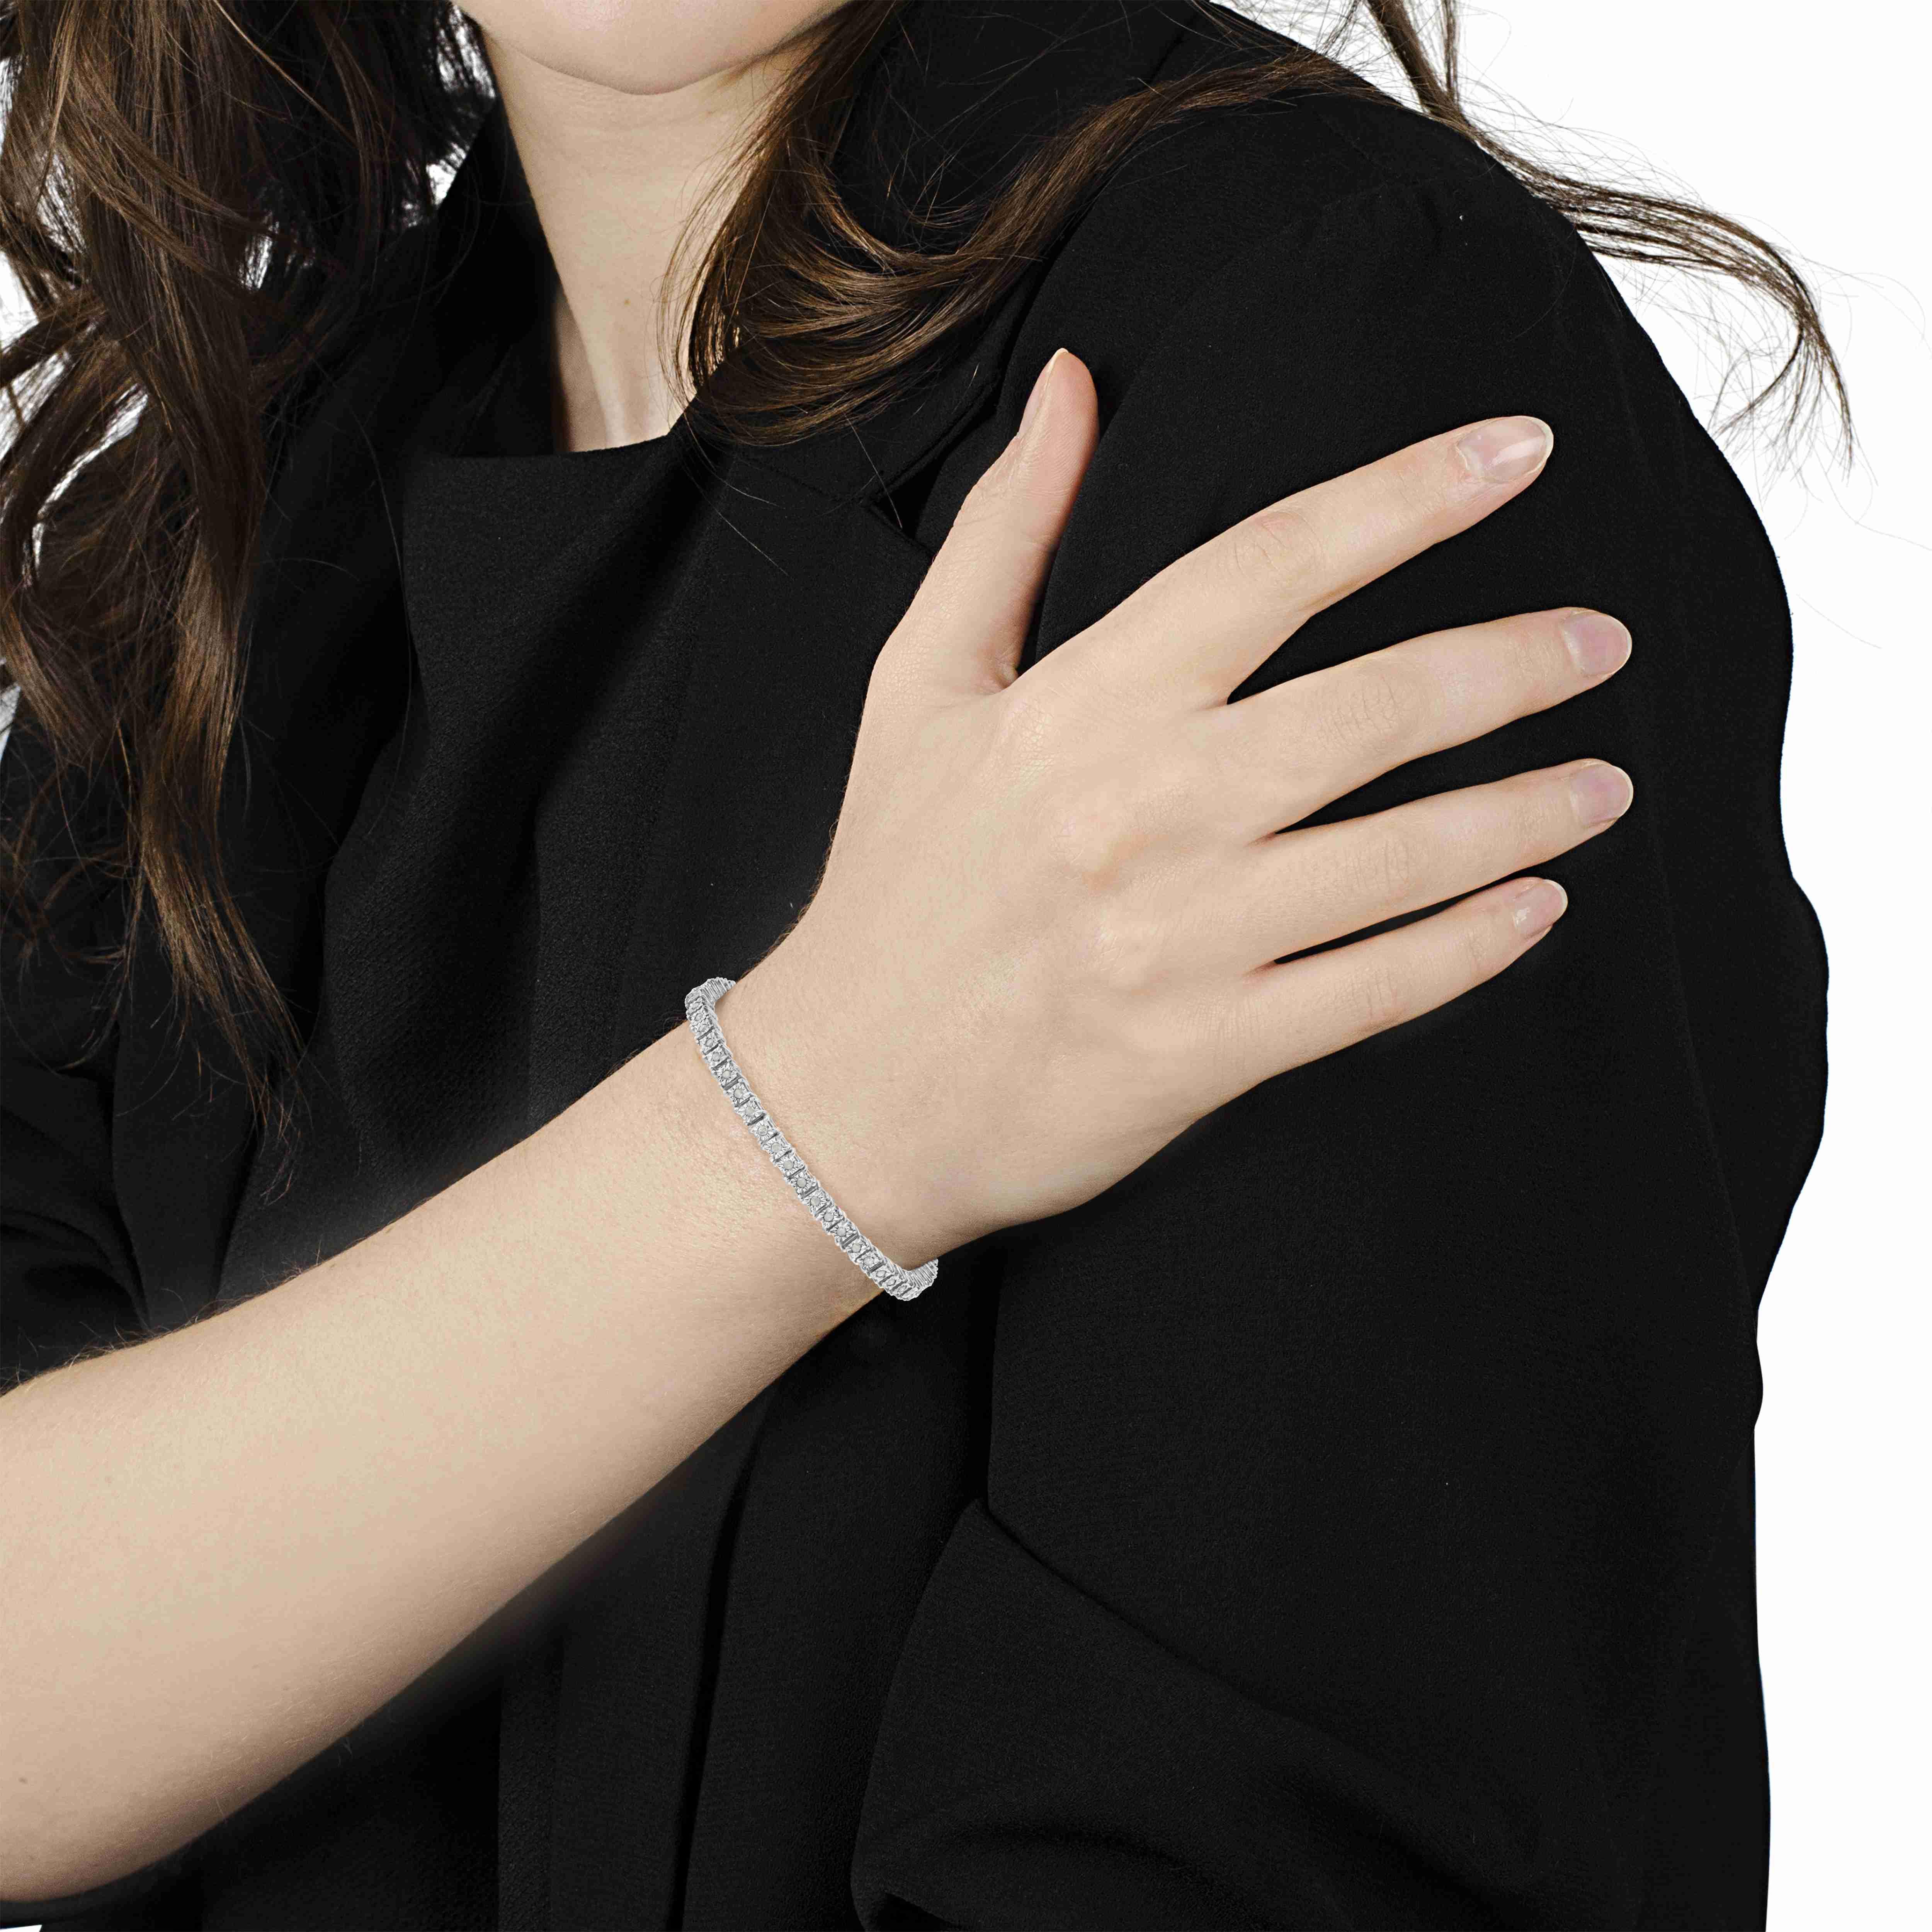 diamond-bracelet with discount code